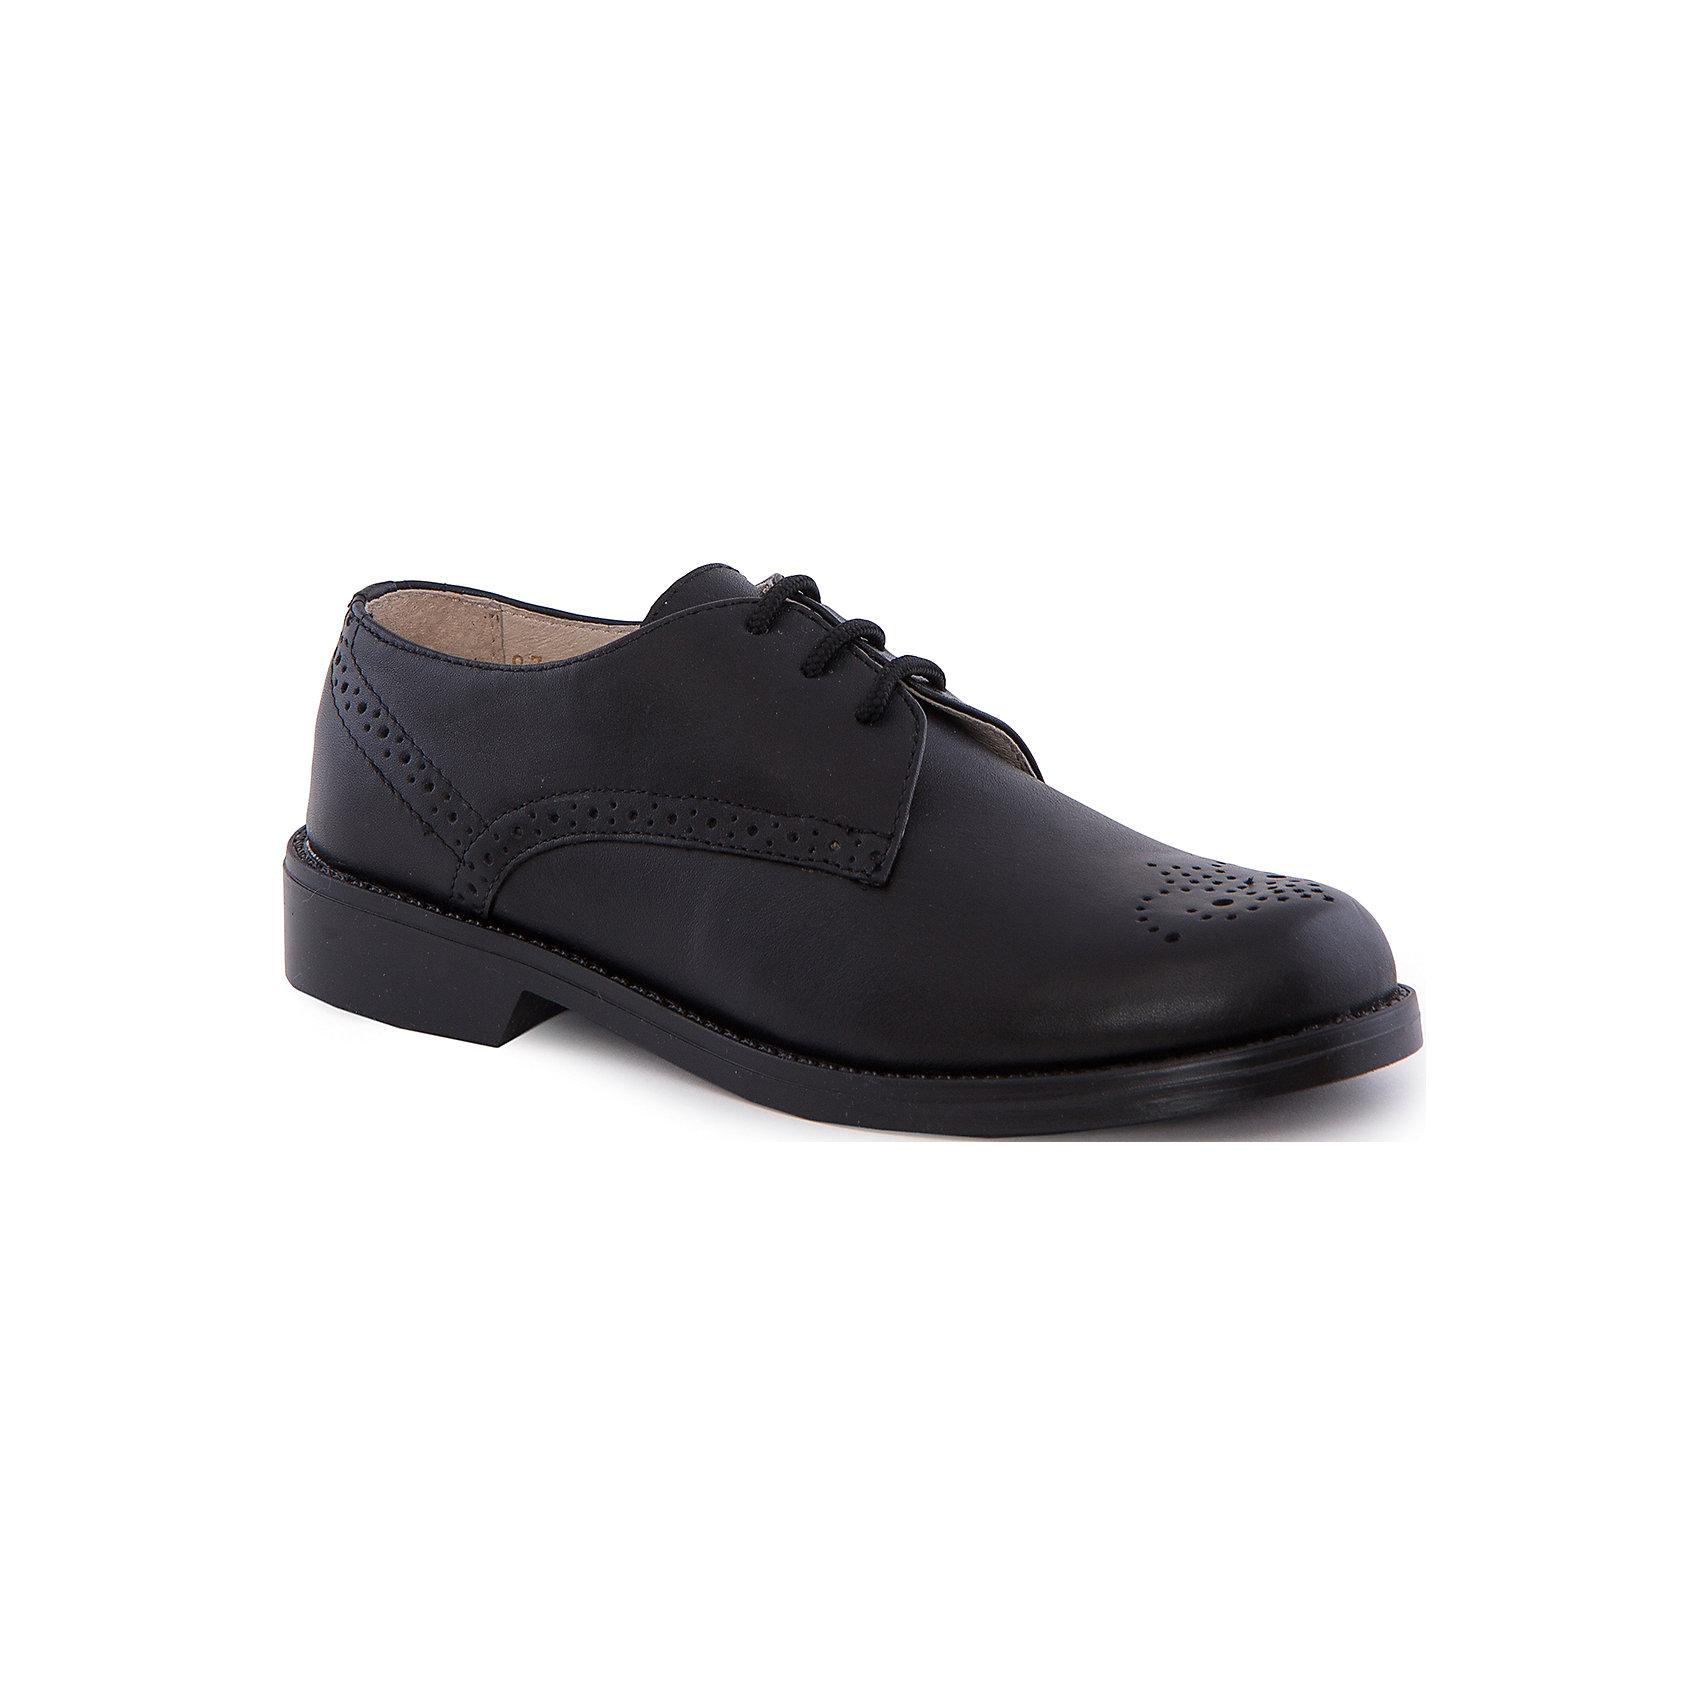 Ботинки для мальчика Зебра